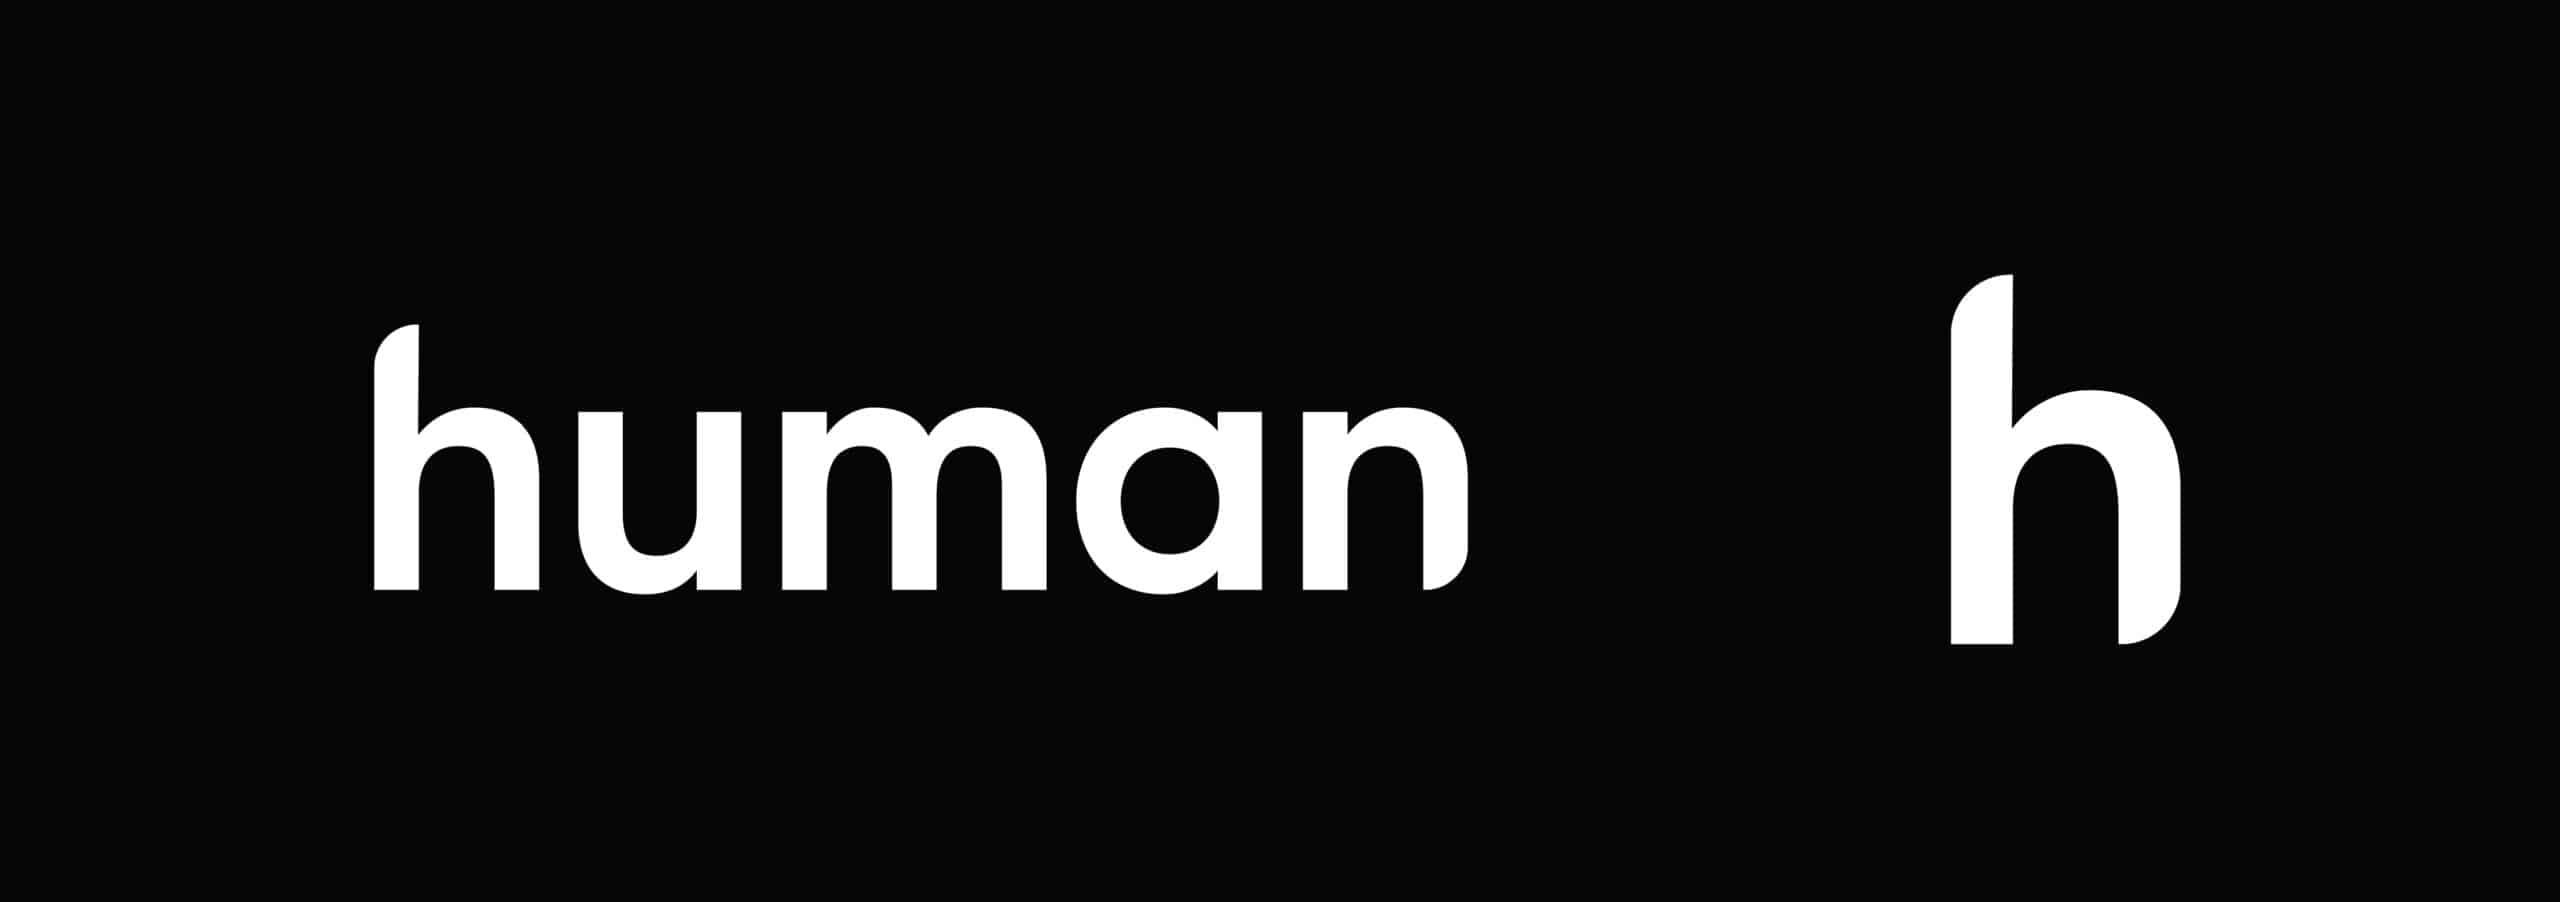 Human_Branding_By_Stellen_Design_Logo Design